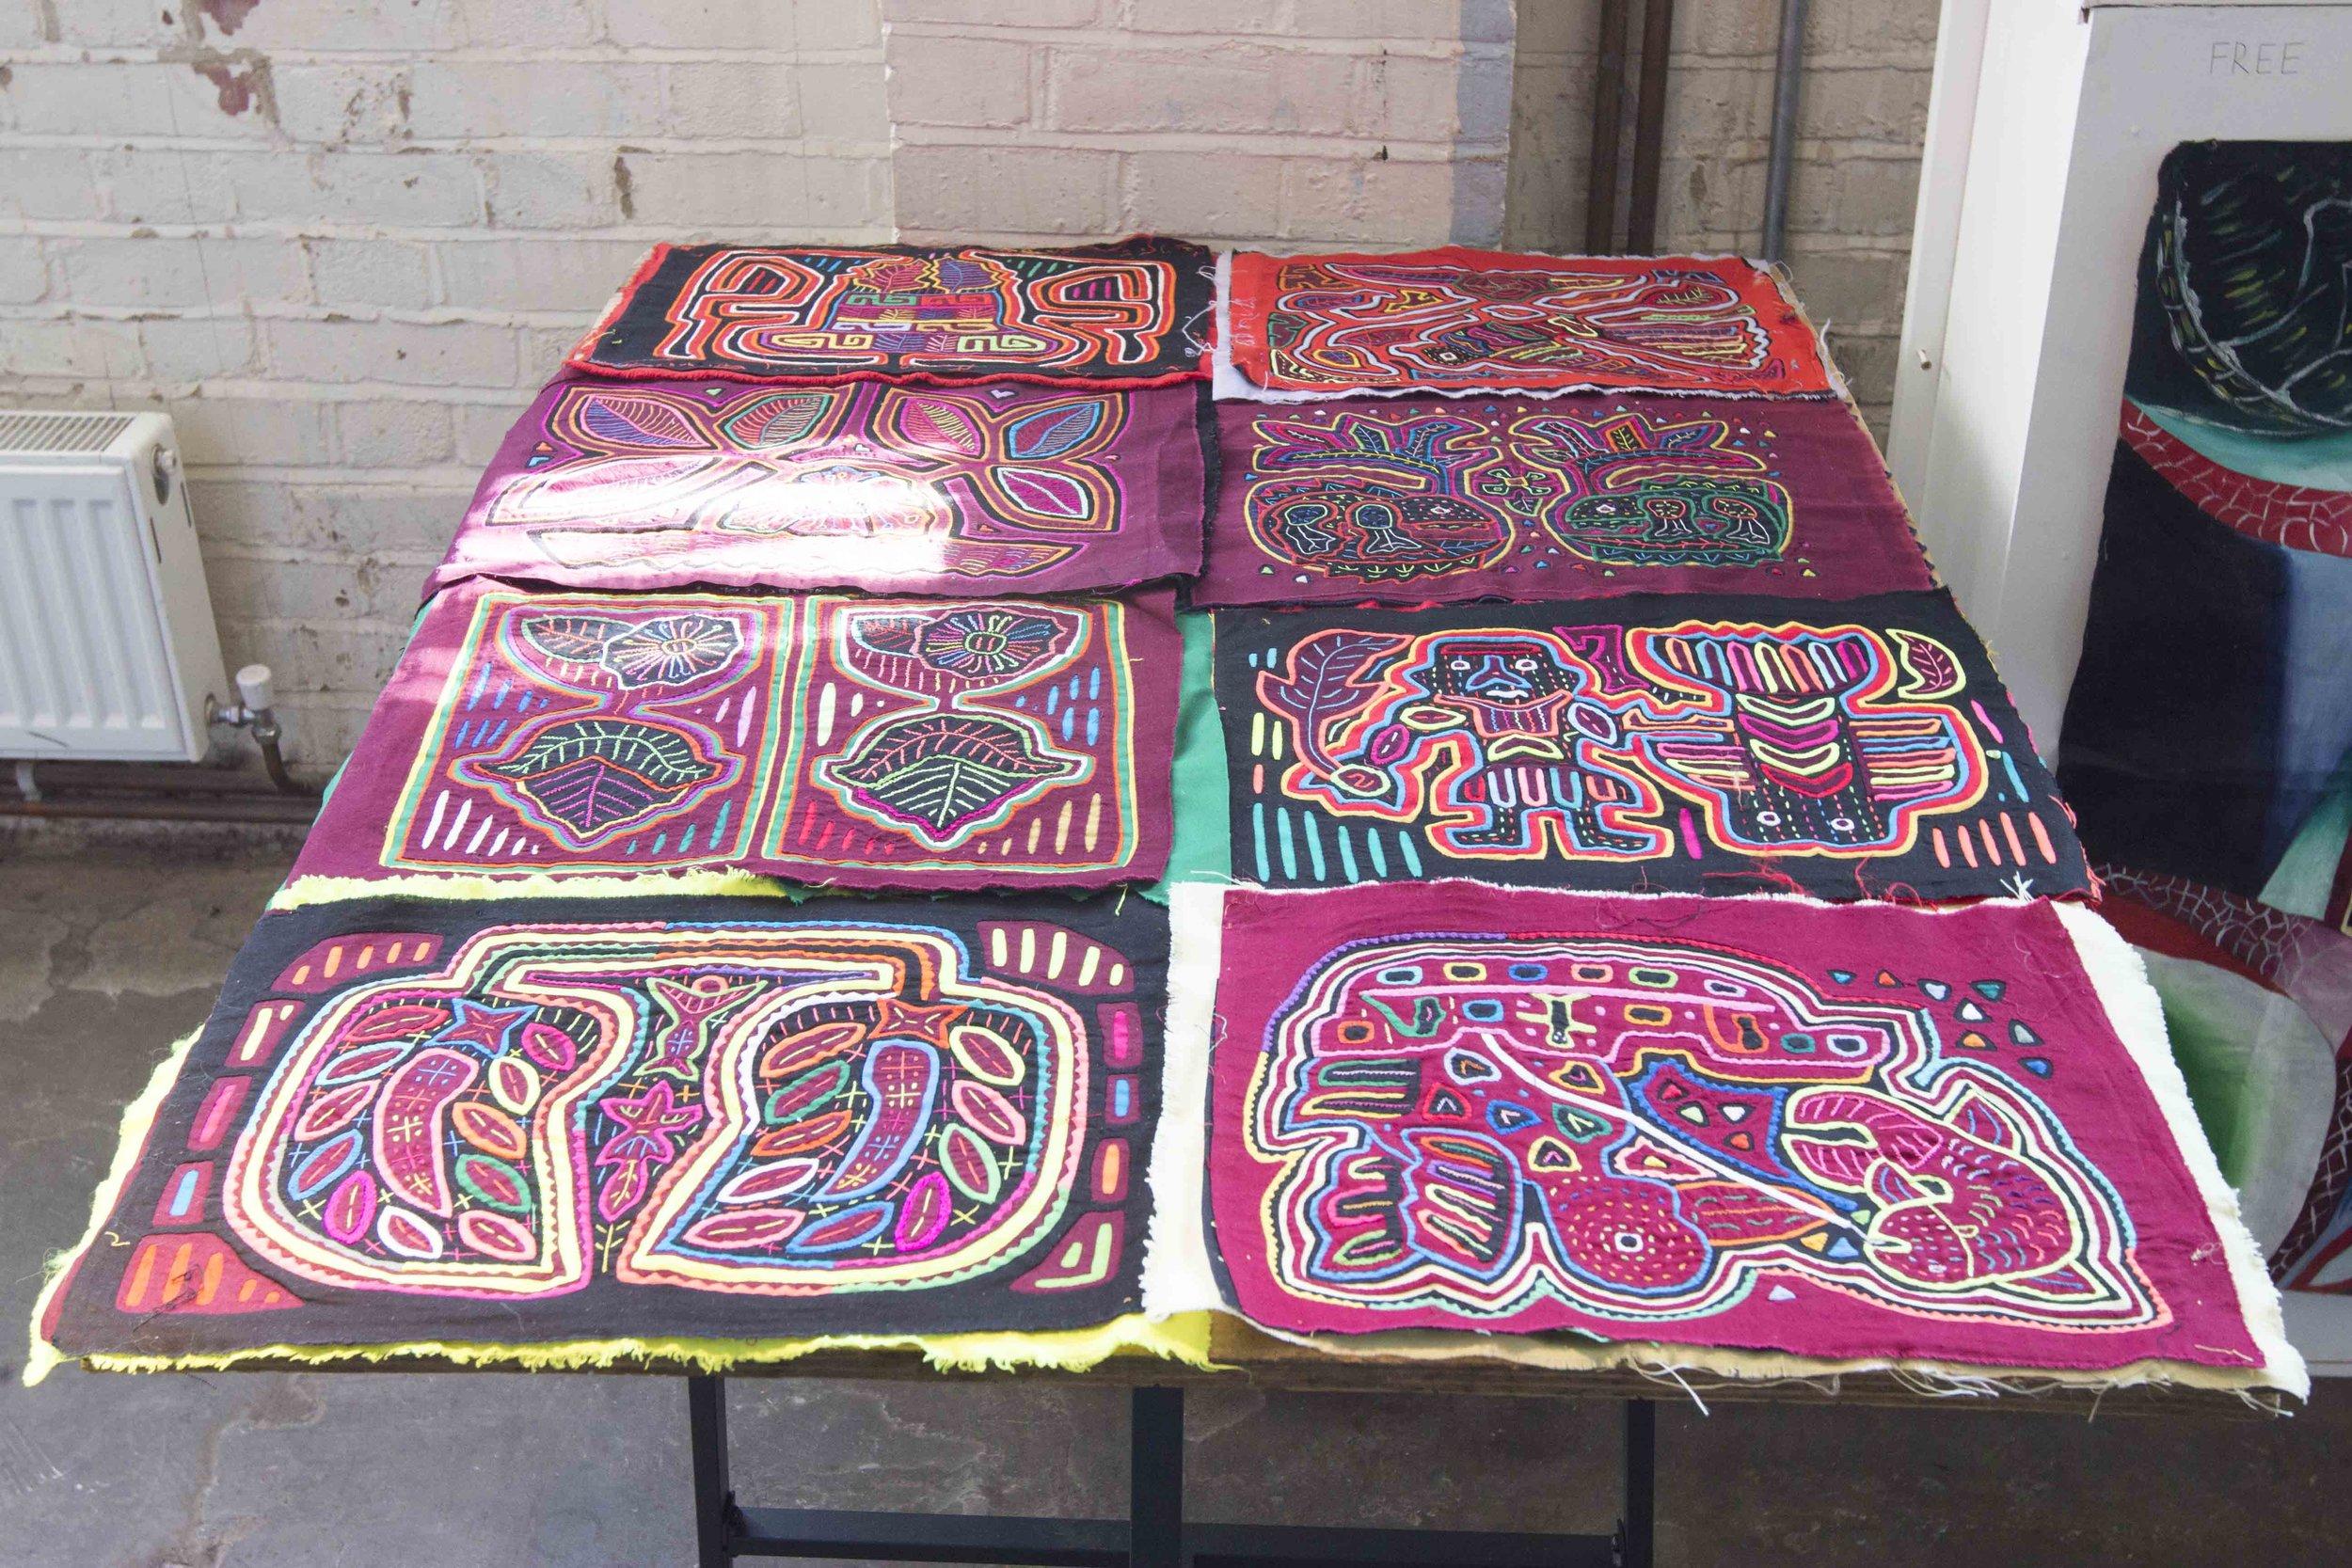 Gladis Arosemena. 2018. Textiles.  Tropic 08ºN